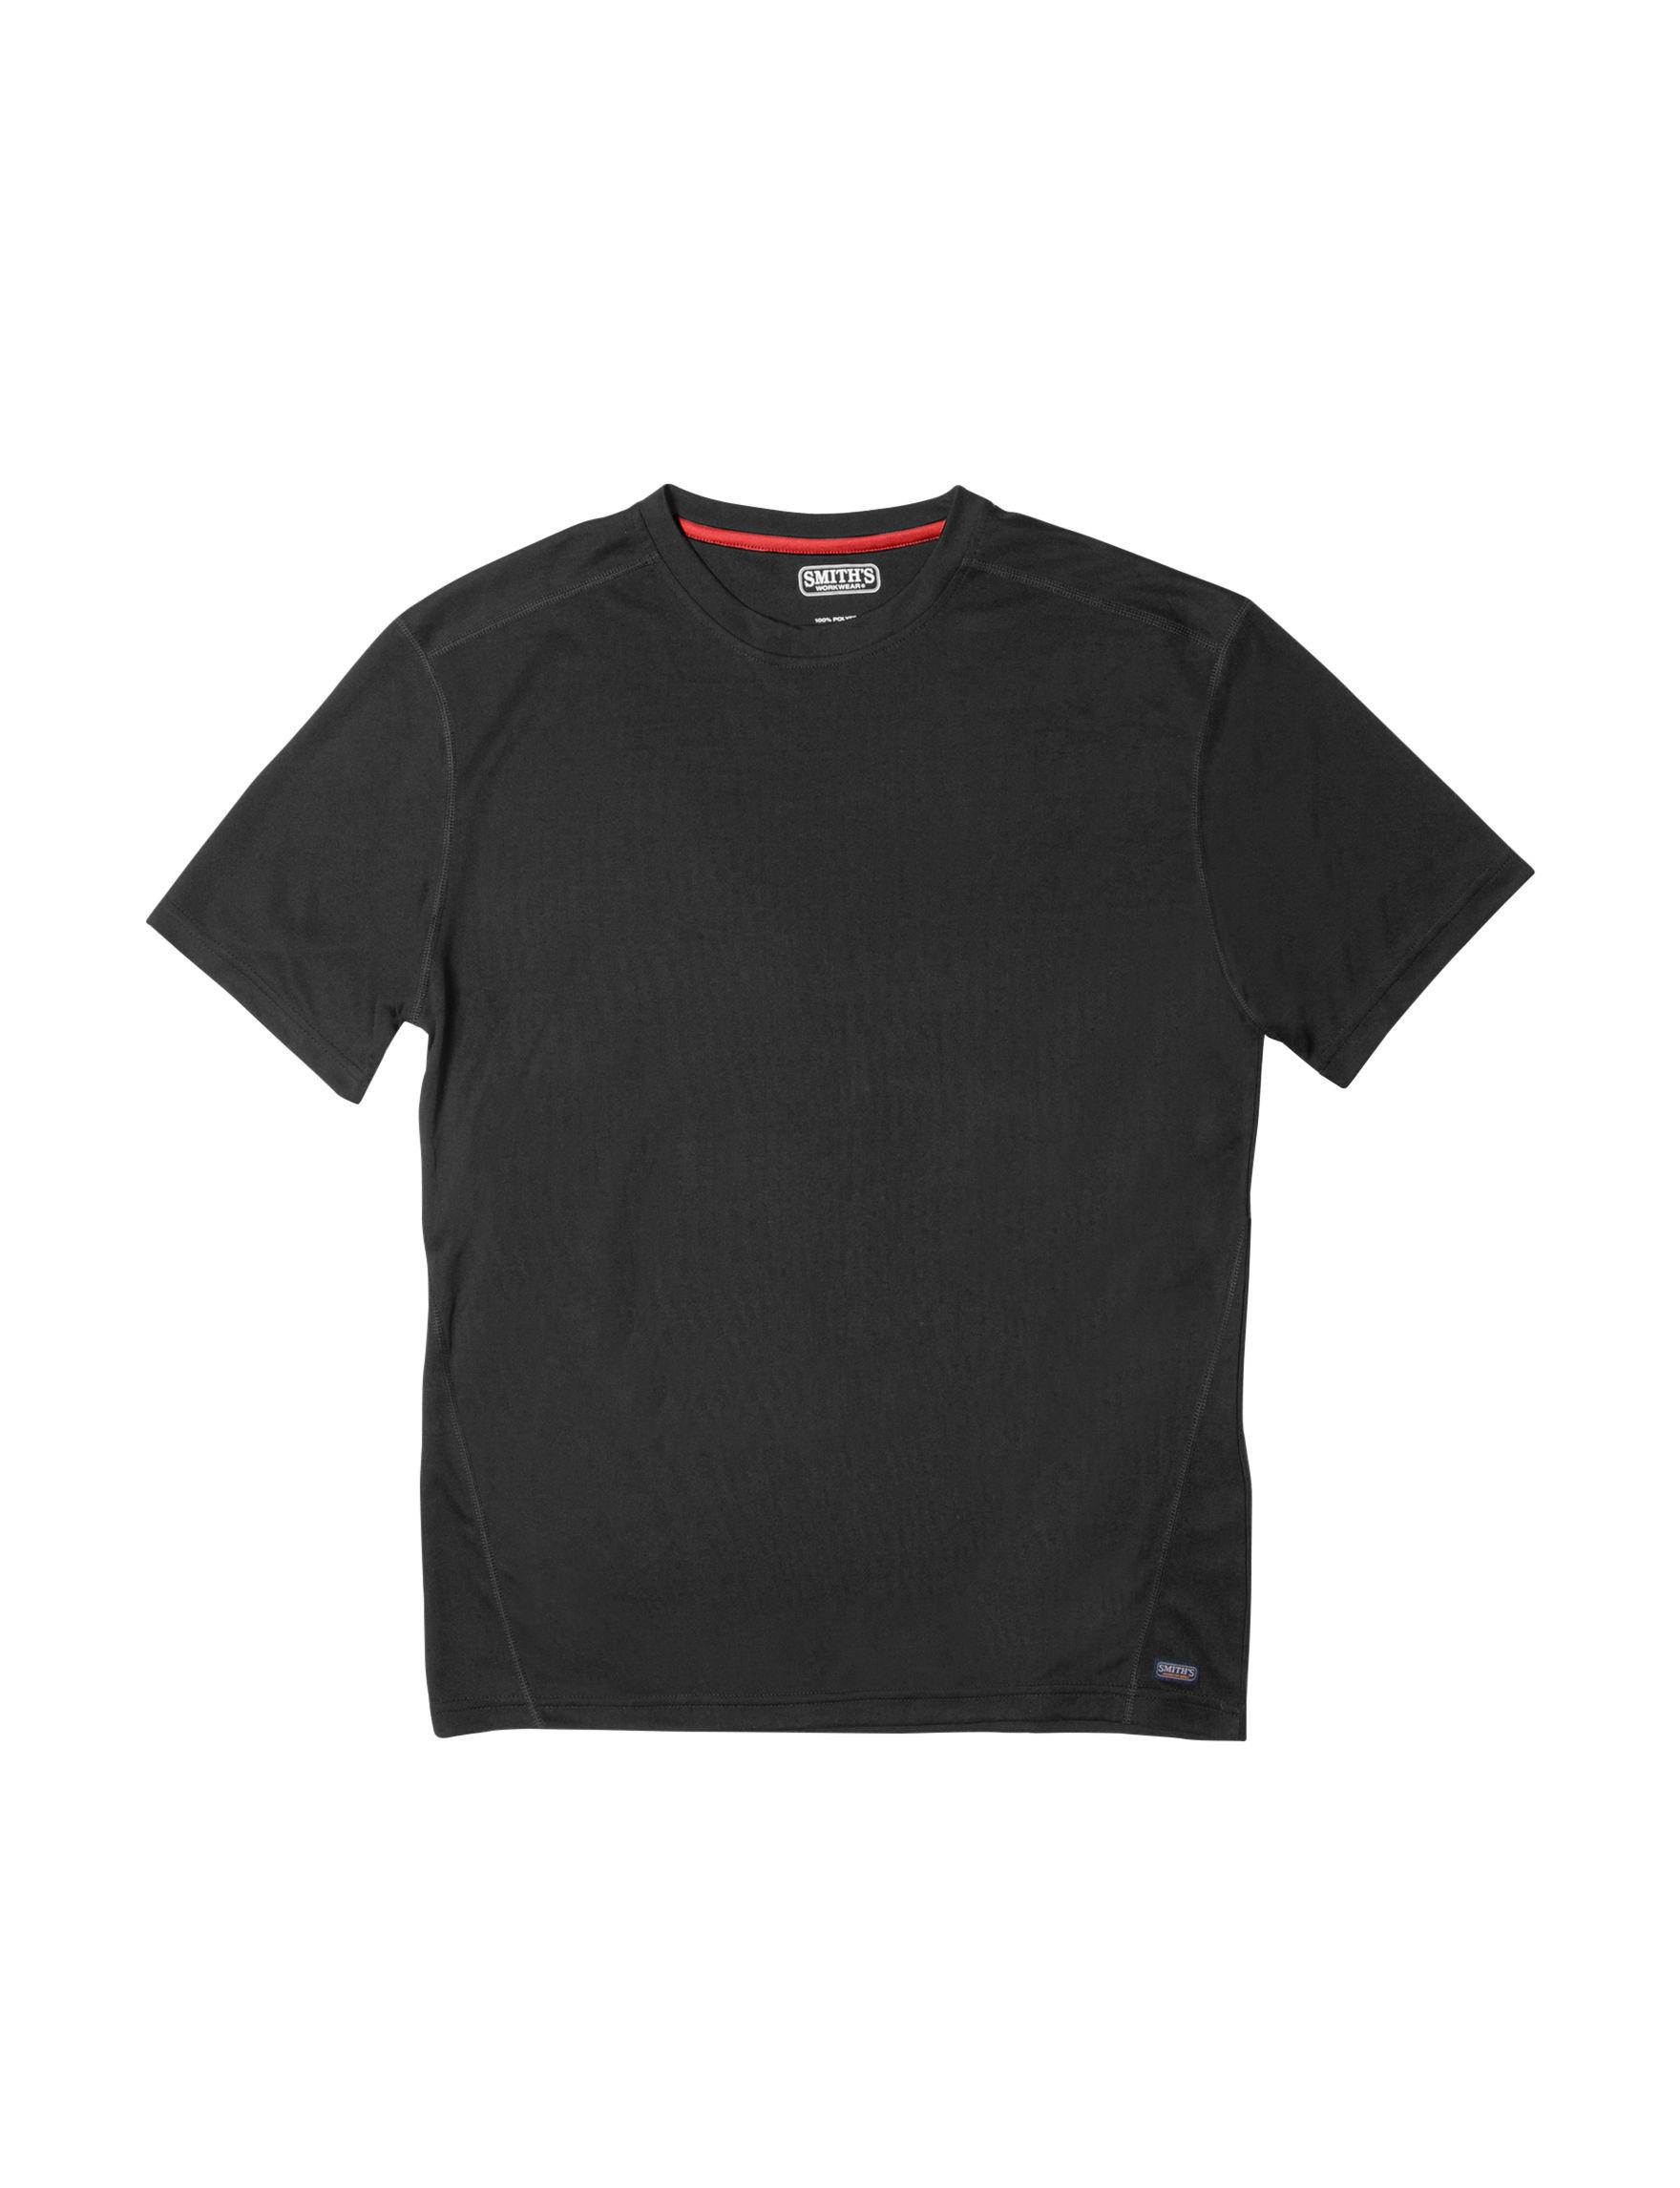 Smith's Workwear Black / Red Tees & Tanks